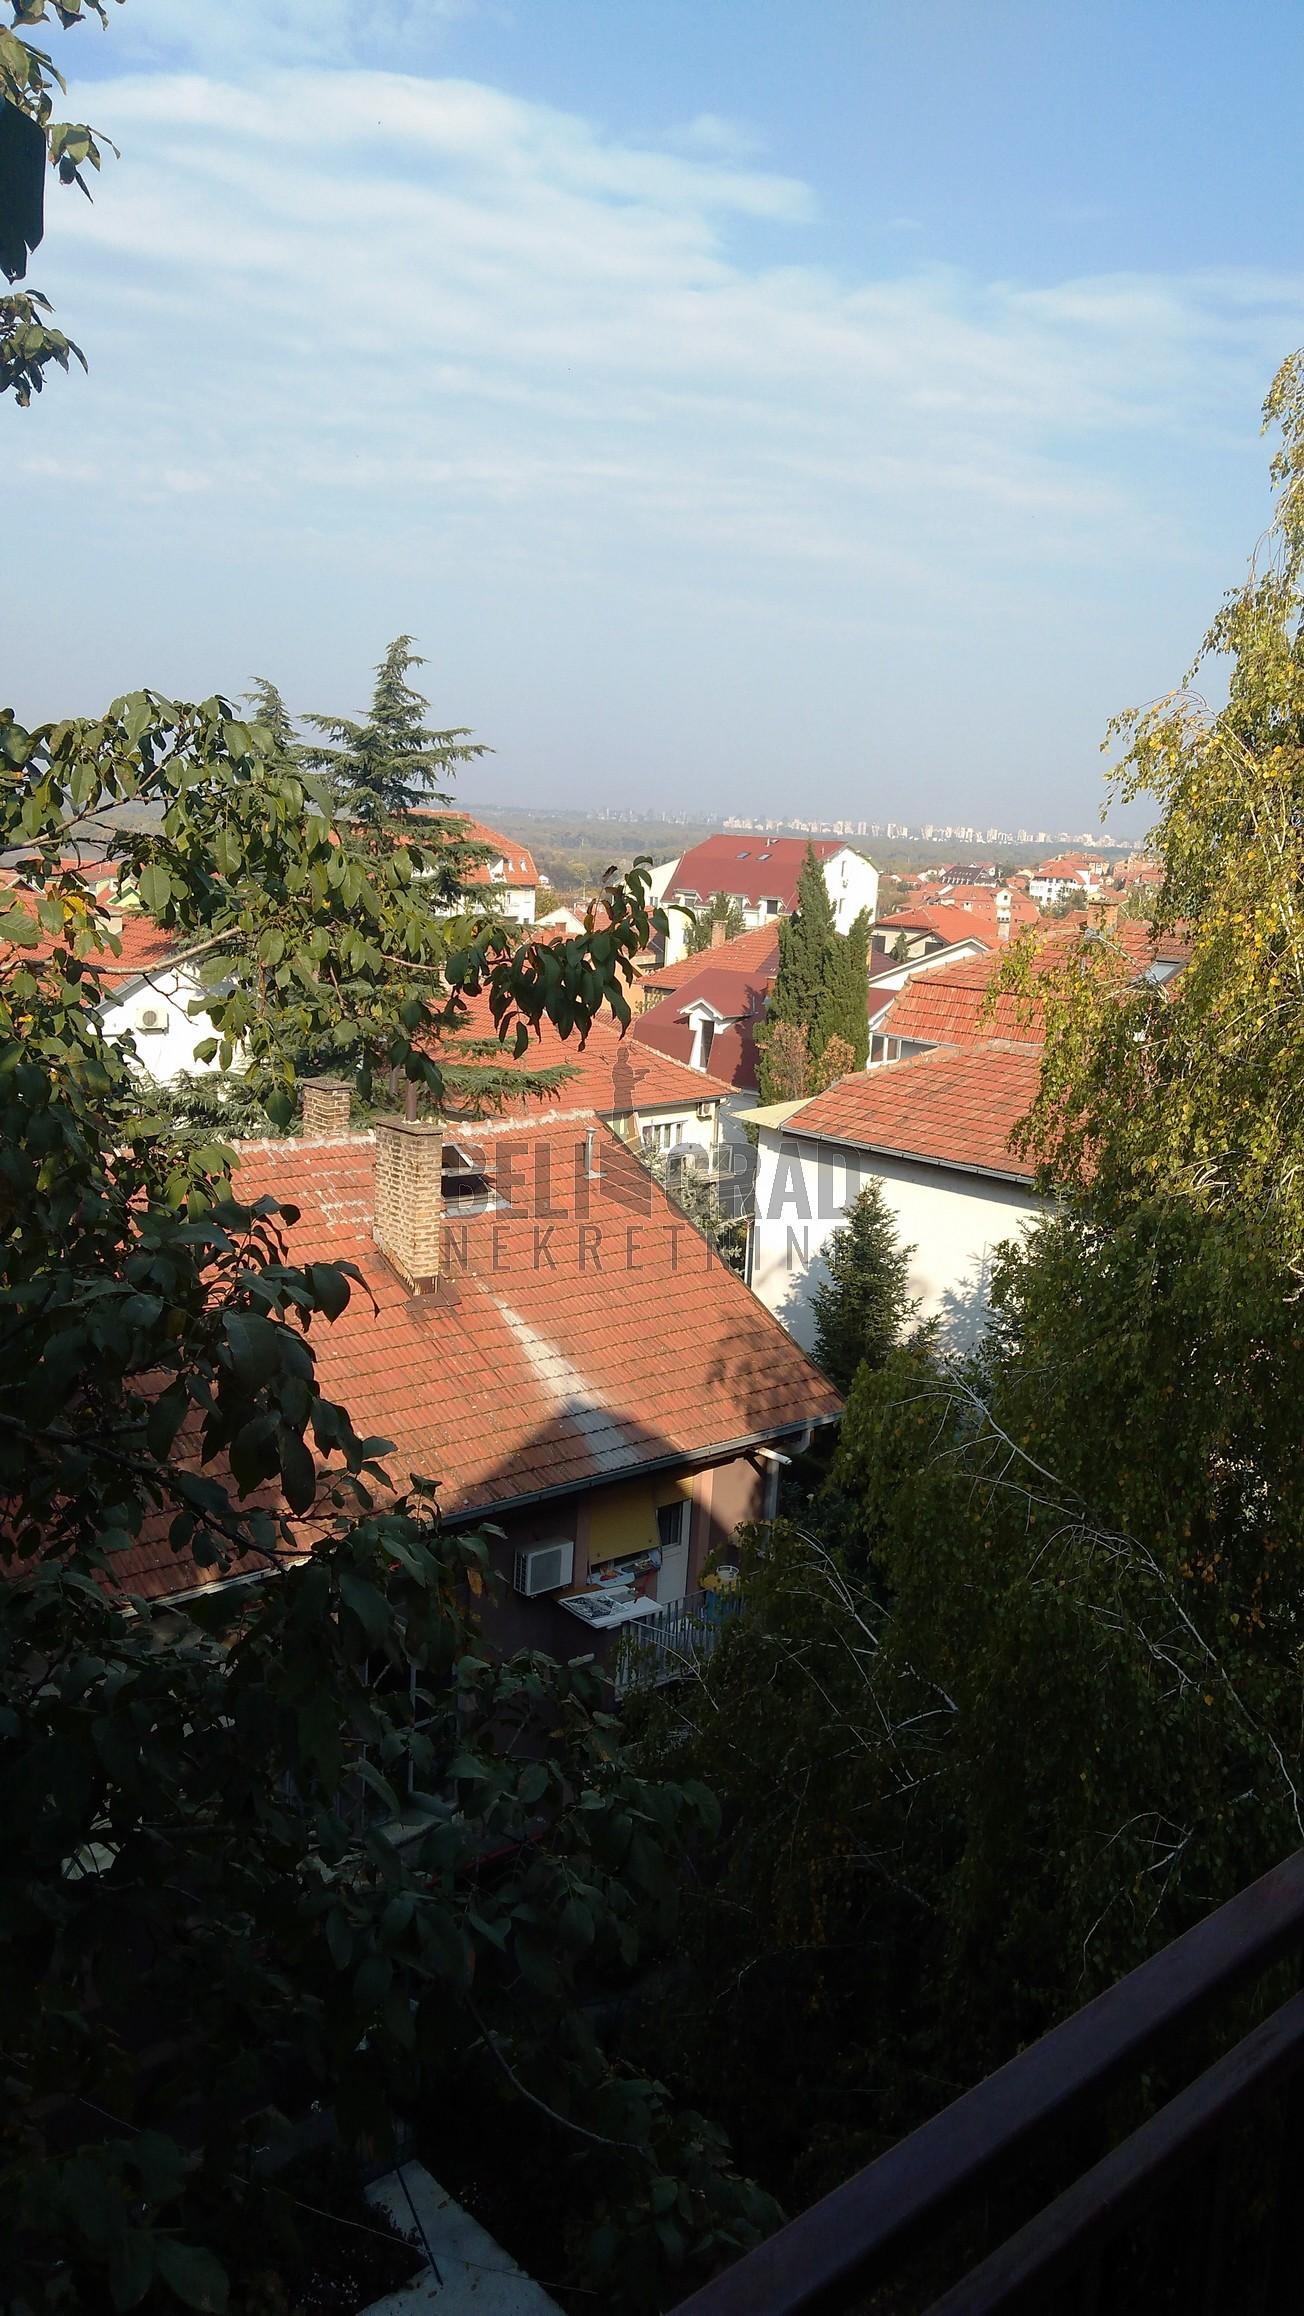 BELE VODE Leposave Vujošević